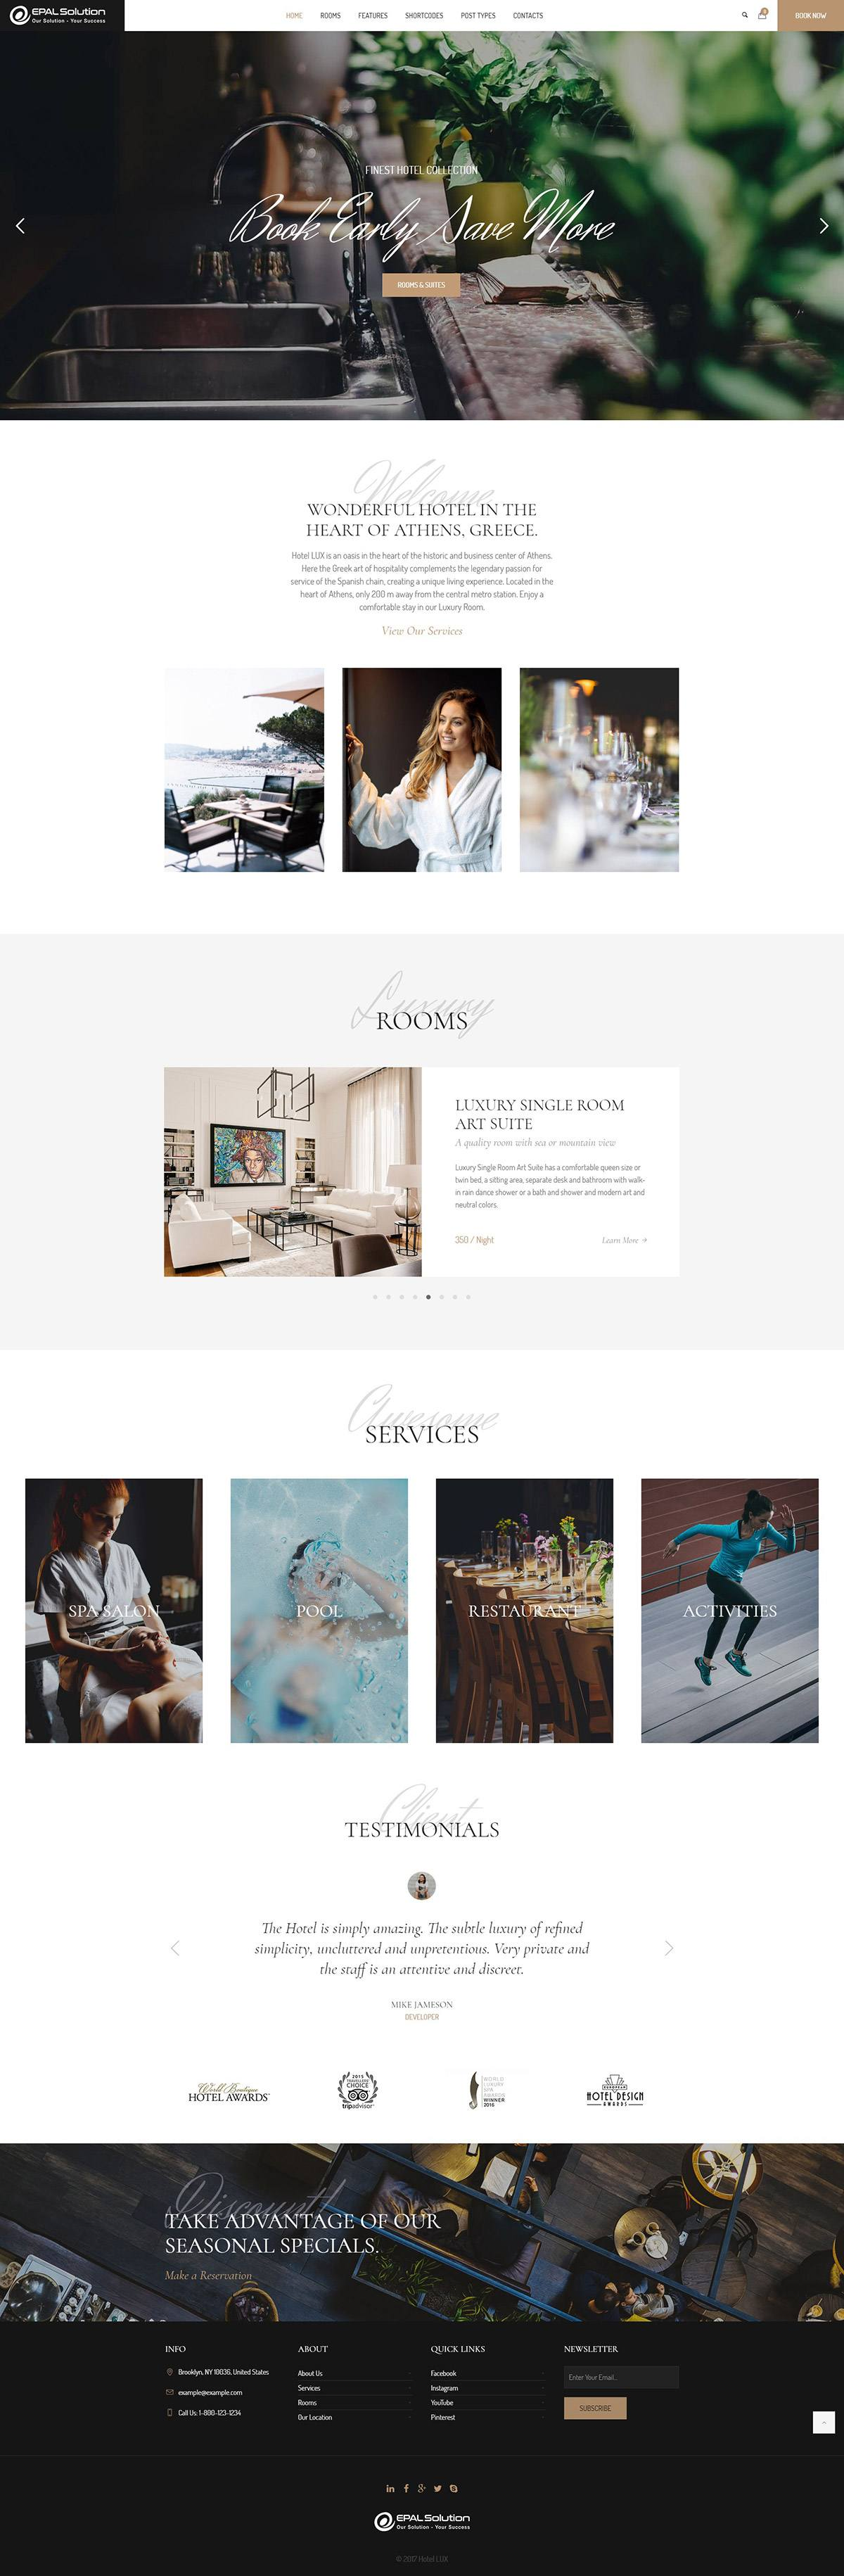 Giao-dien-website-khach-san-Hotel-Lux